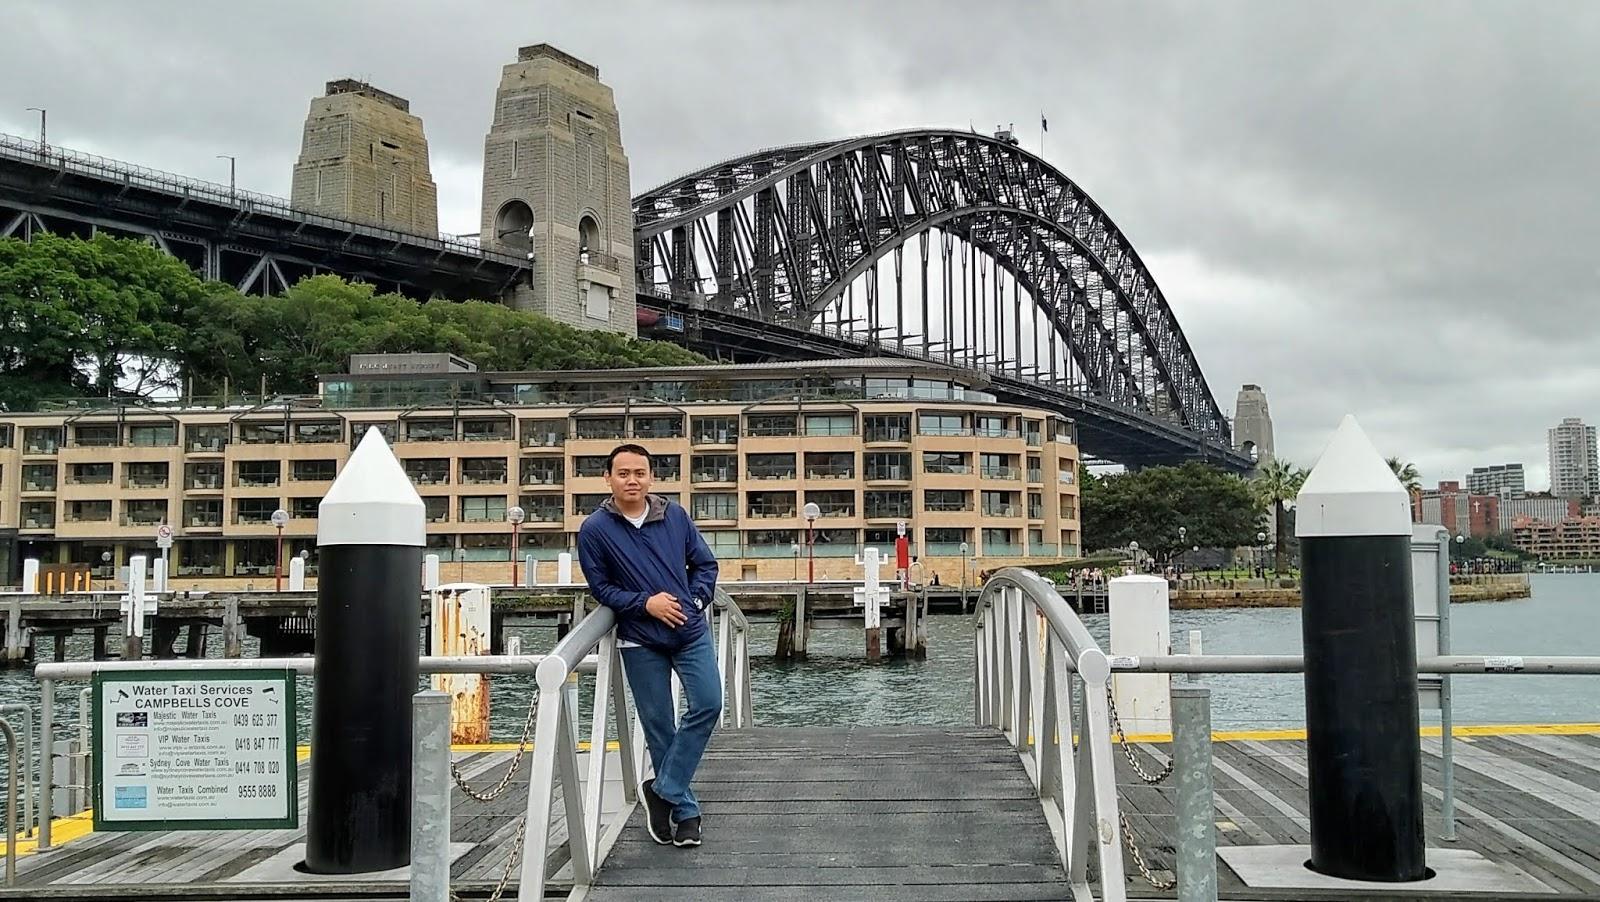 Harbour Bridge, The Rocks, Sydney, New South Wales, Australia, irfan-room.com